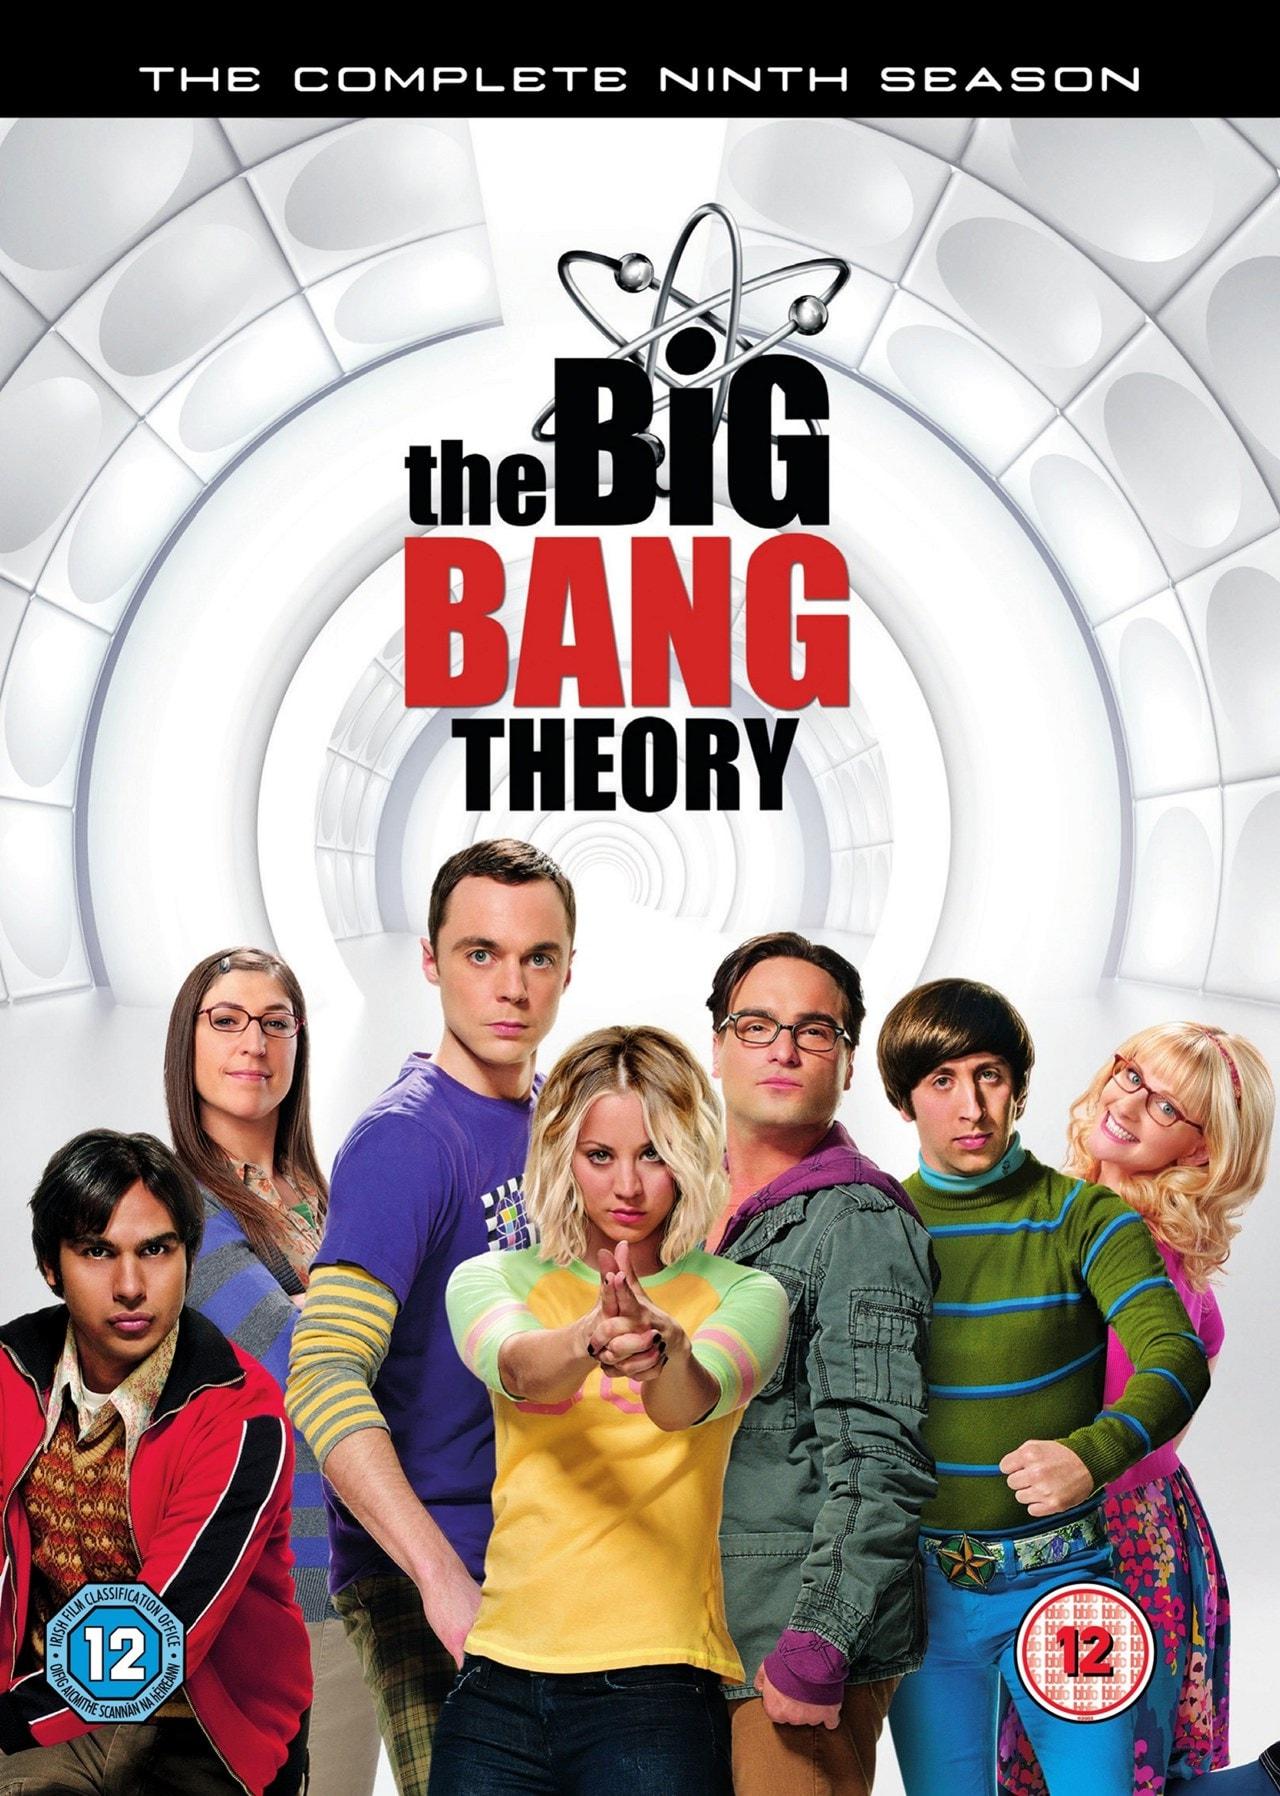 The Big Bang Theory: The Complete Ninth Season - 1